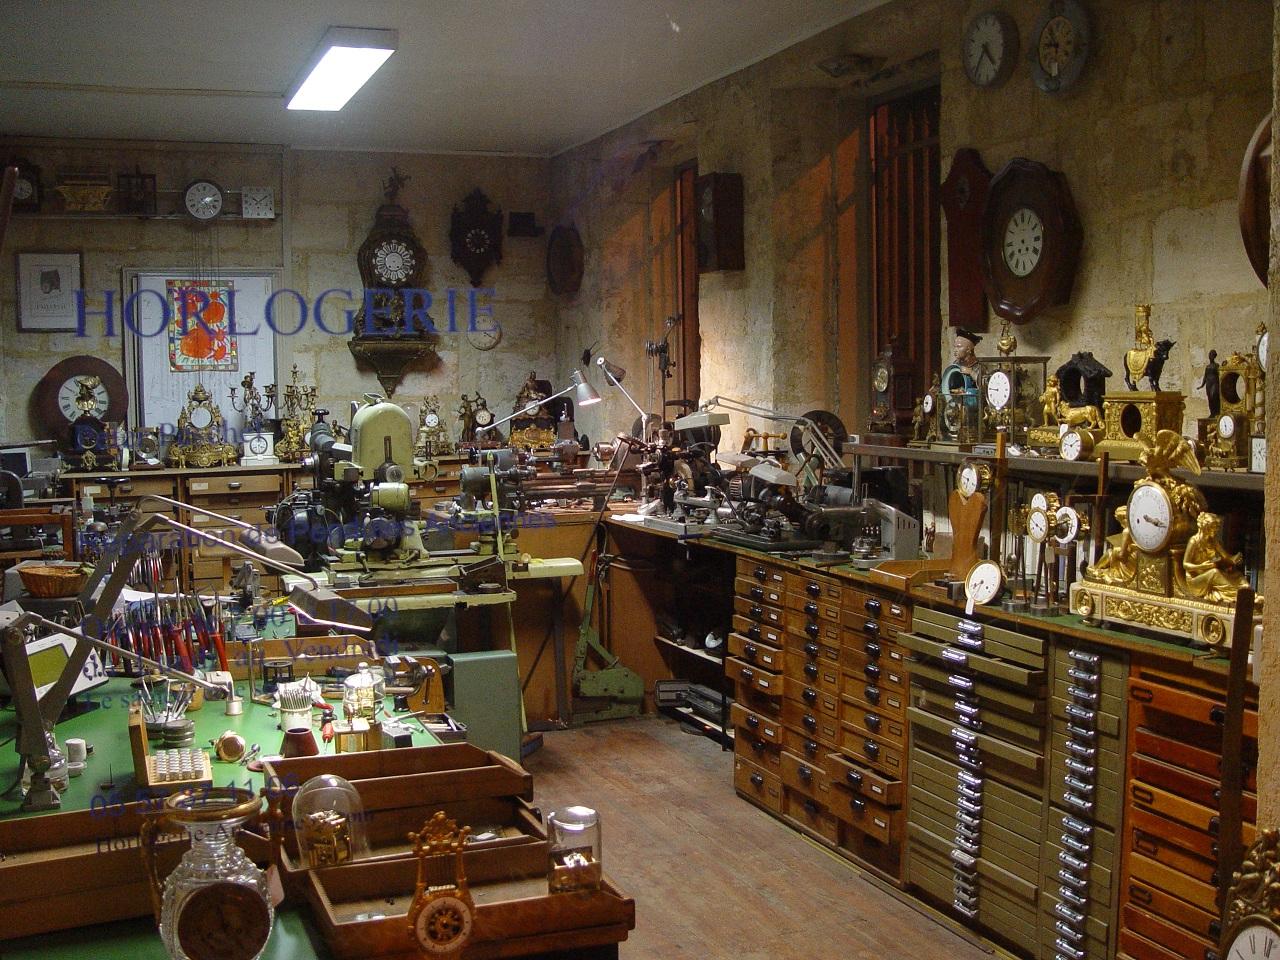 Peter Peschel Restauration Rparation Horlogerie Pendules